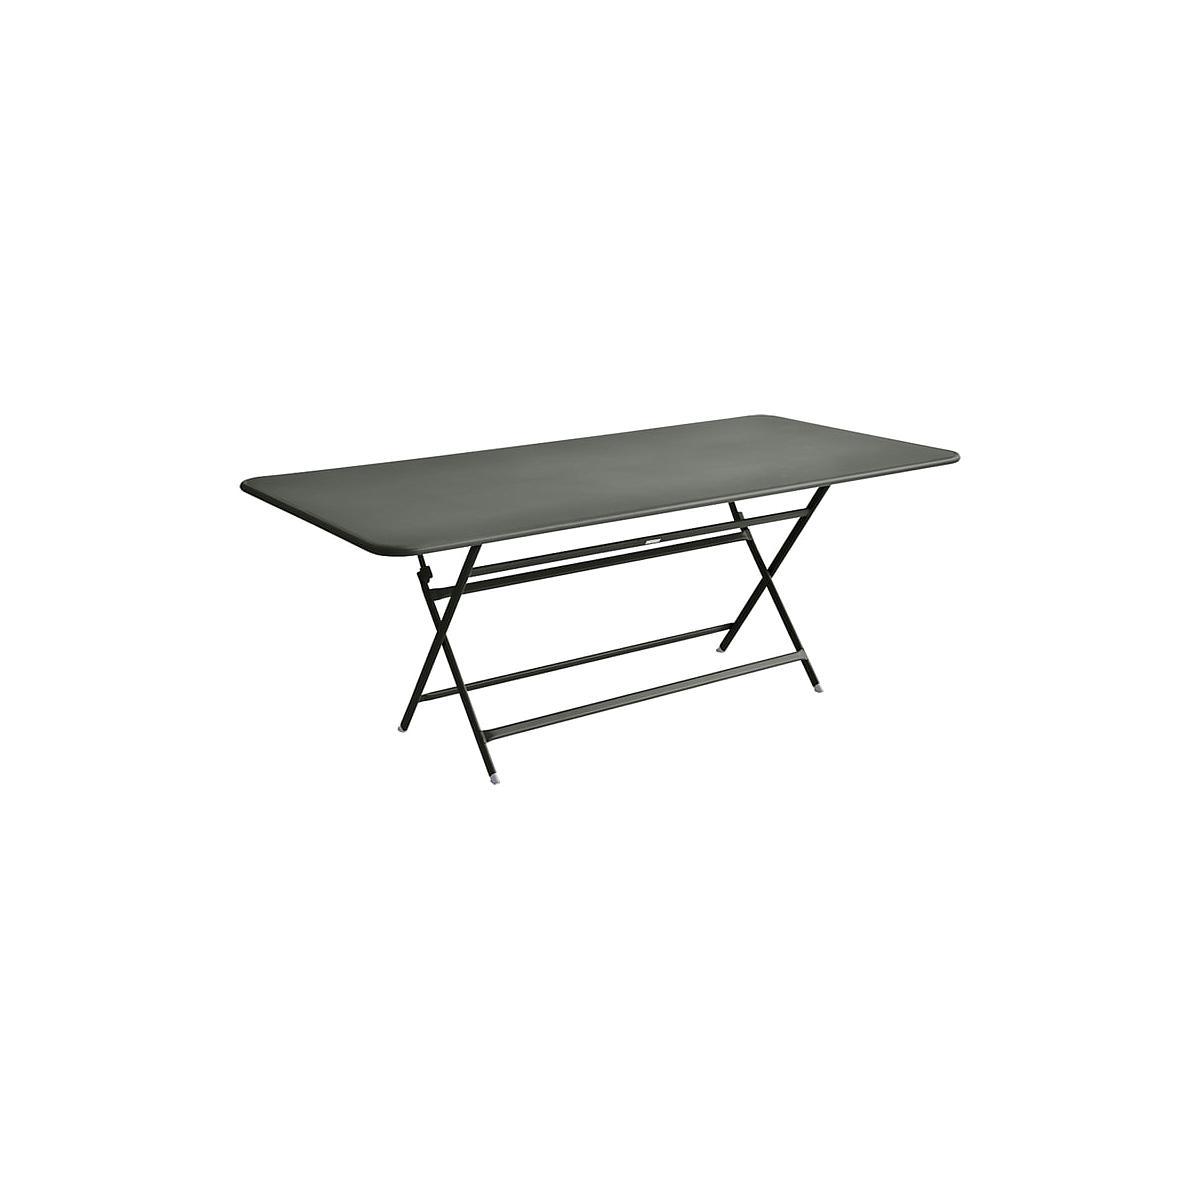 Table 90x190cm pliante CARACTERE Fermob Romarin